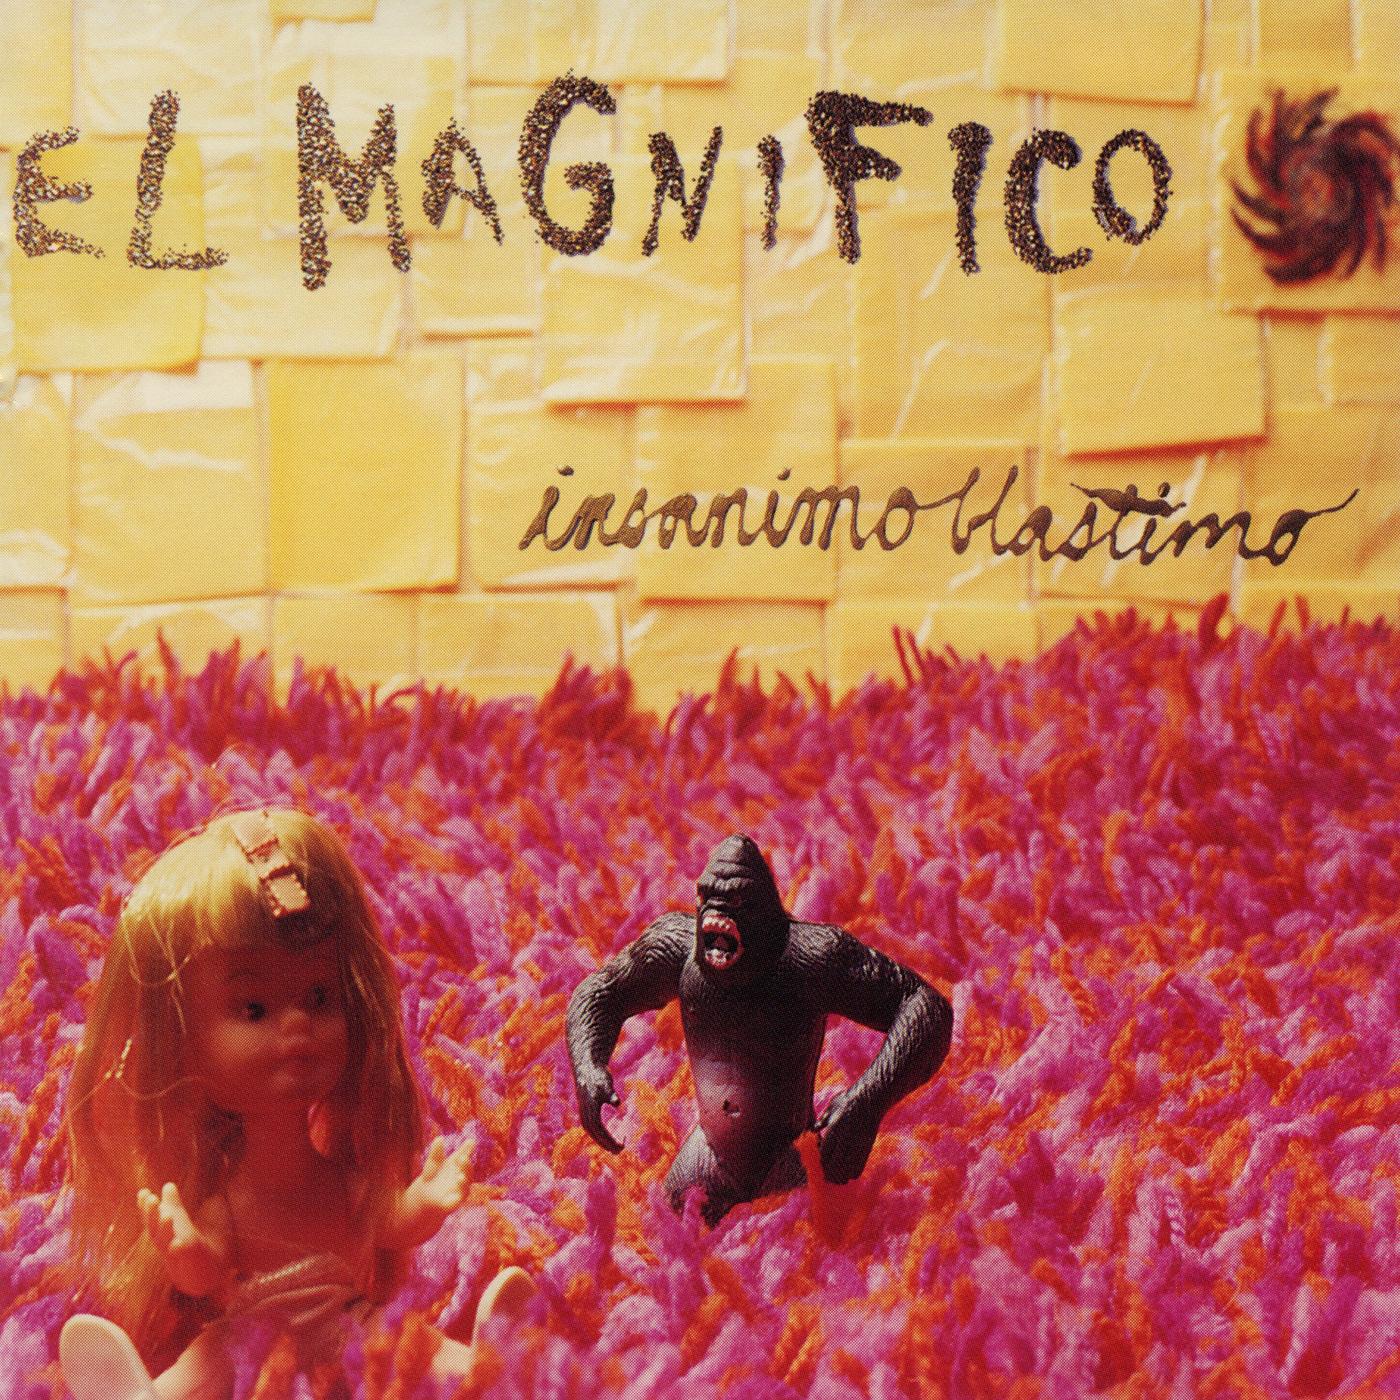 Insanimo Blastimo - El Magnifico